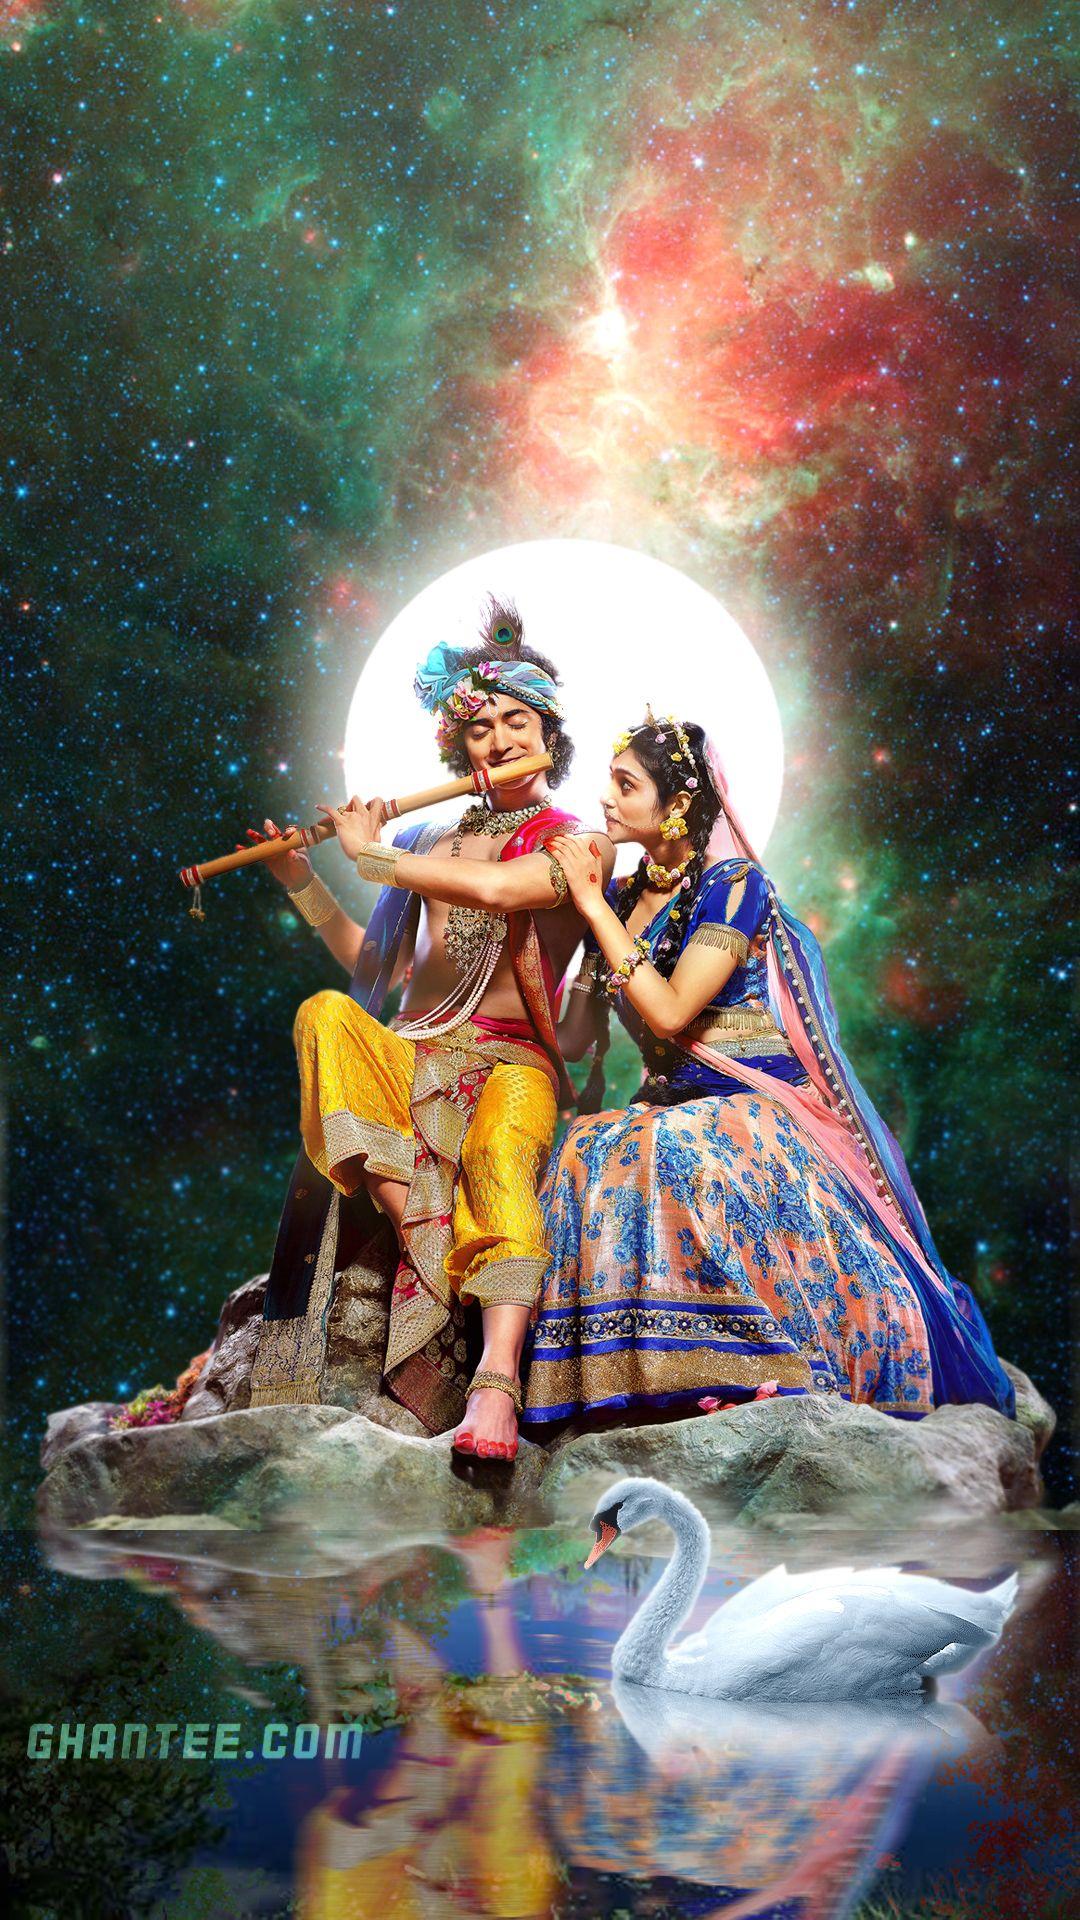 Starbharat Radhakrishna Eternal Lovers Hd Phone Wallpaper Ghantee In 2021 Krishna Wallpaper Radha Krishna Wallpaper Krishna Photos Radha krishna love wallpaper hd 3d full